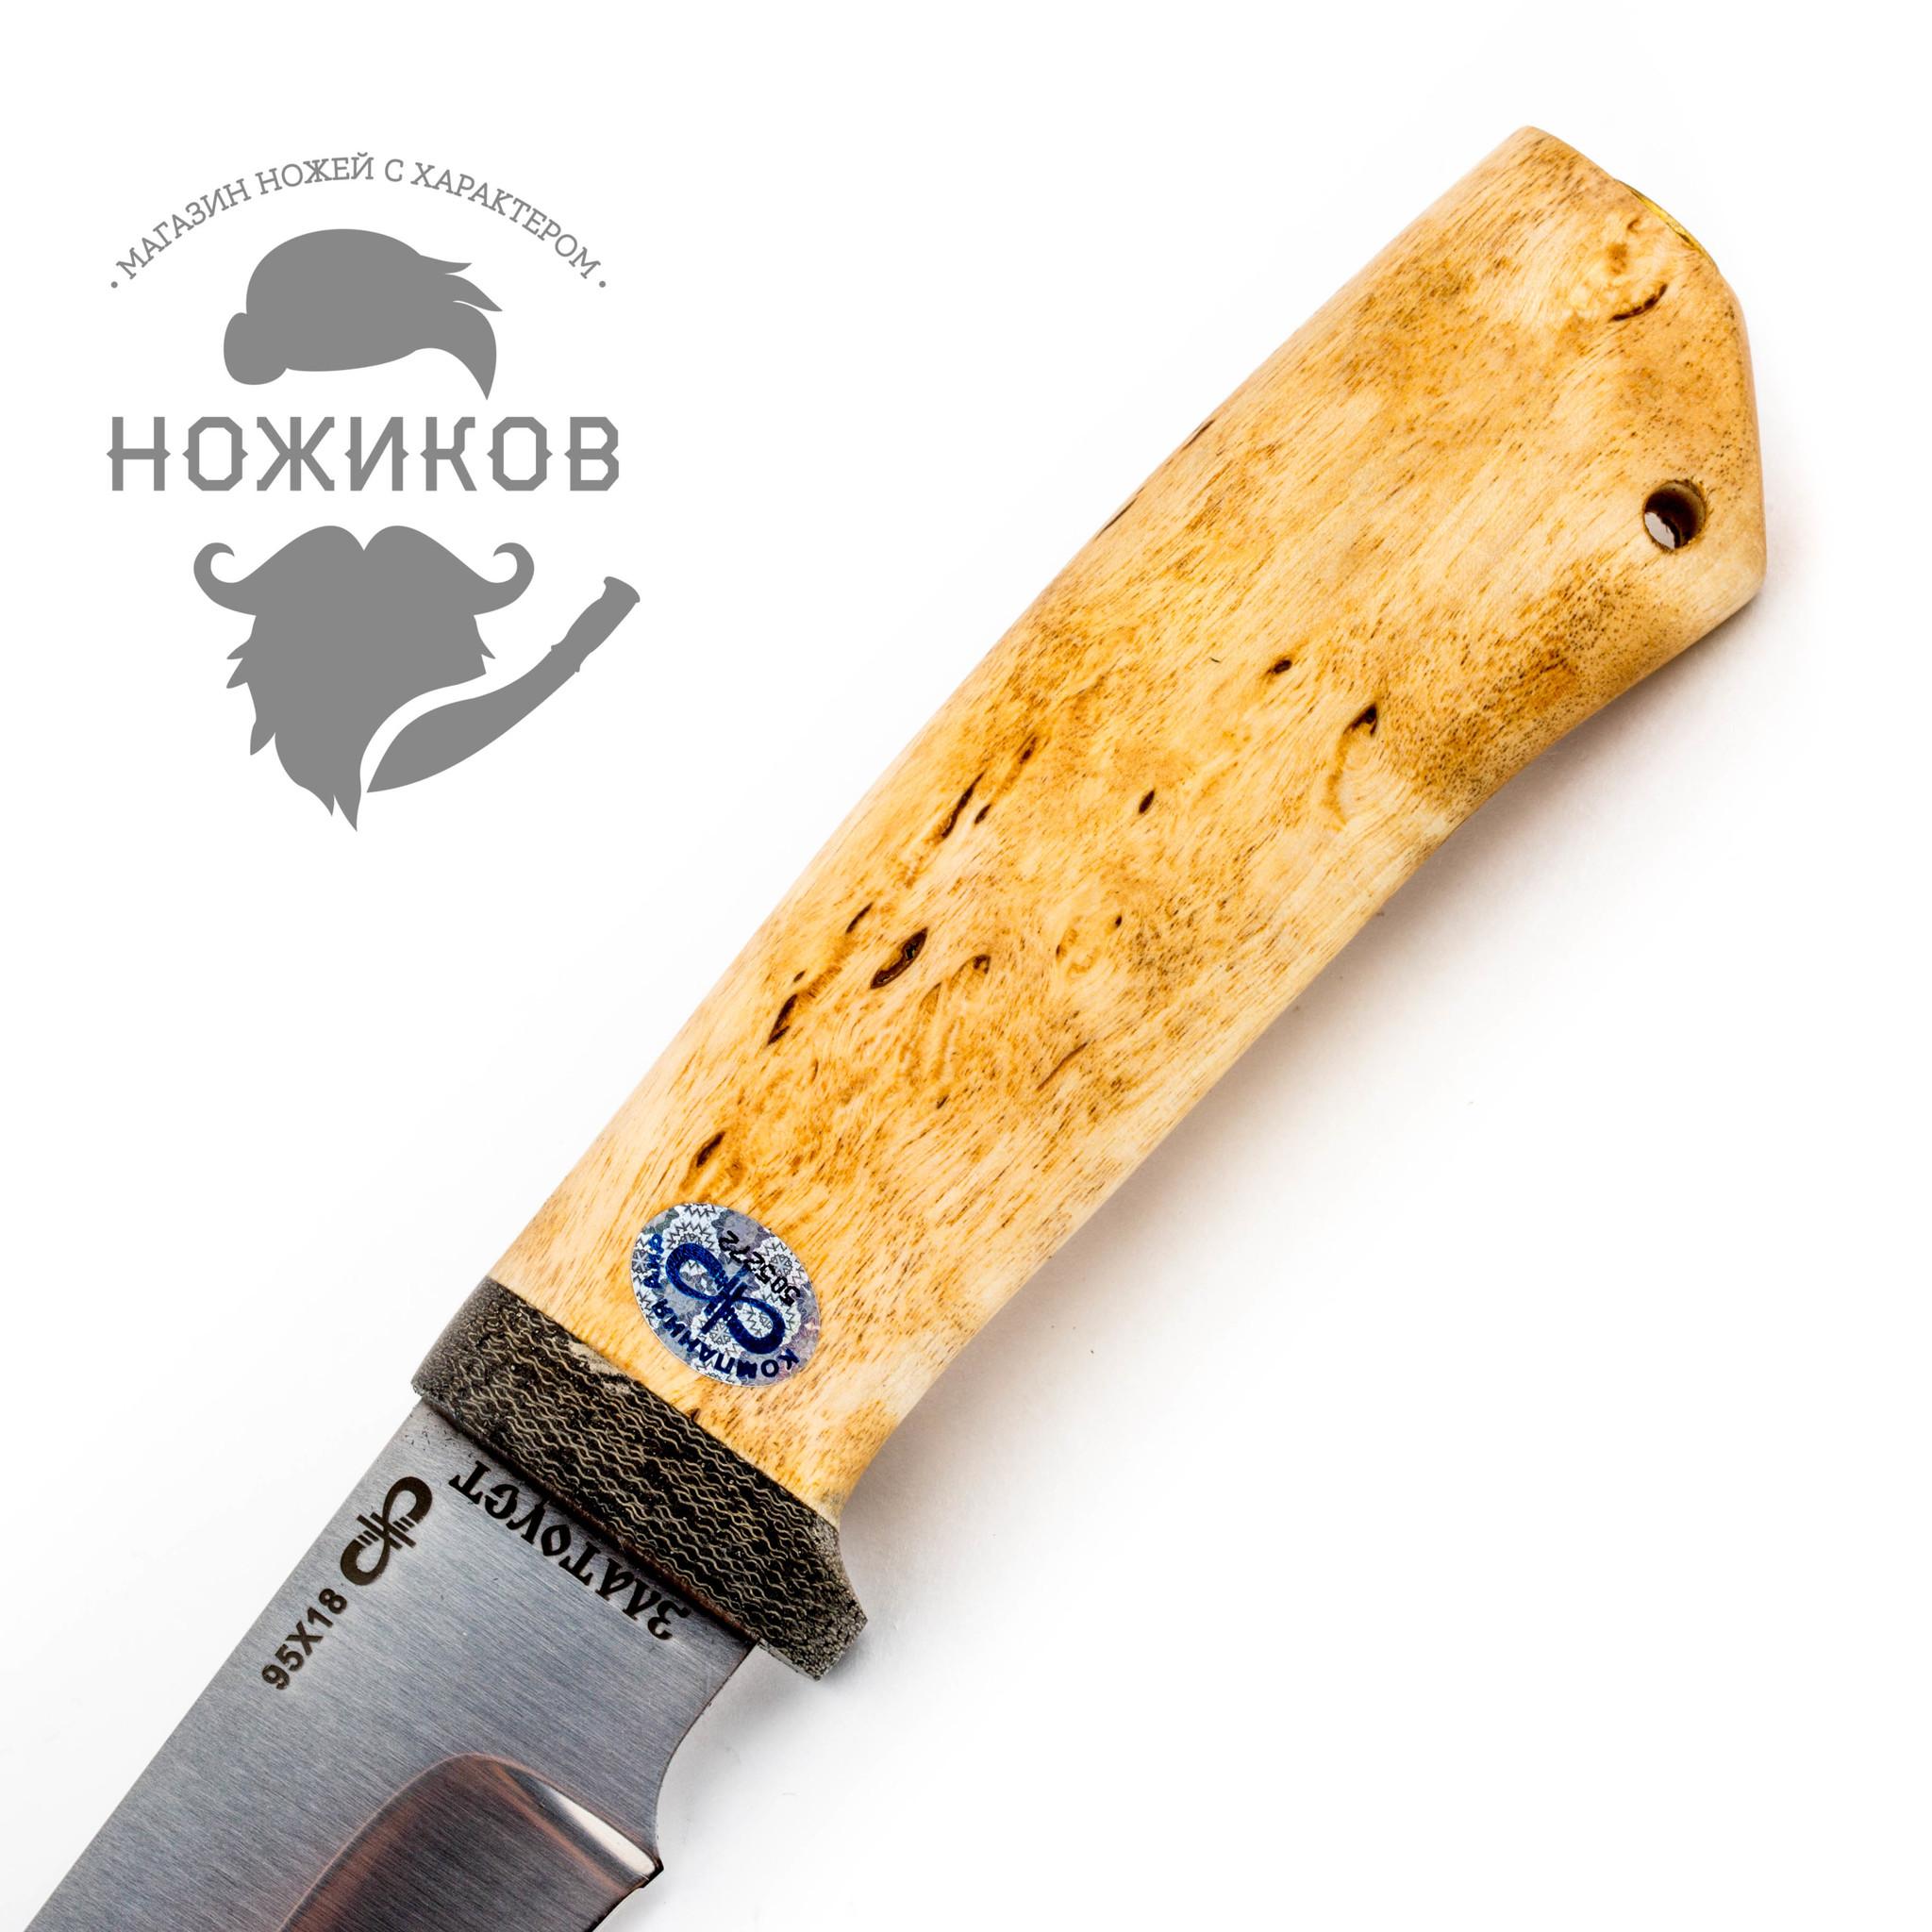 Фото 3 - Нож Стрелец, карельская береза, 95х18 от АиР